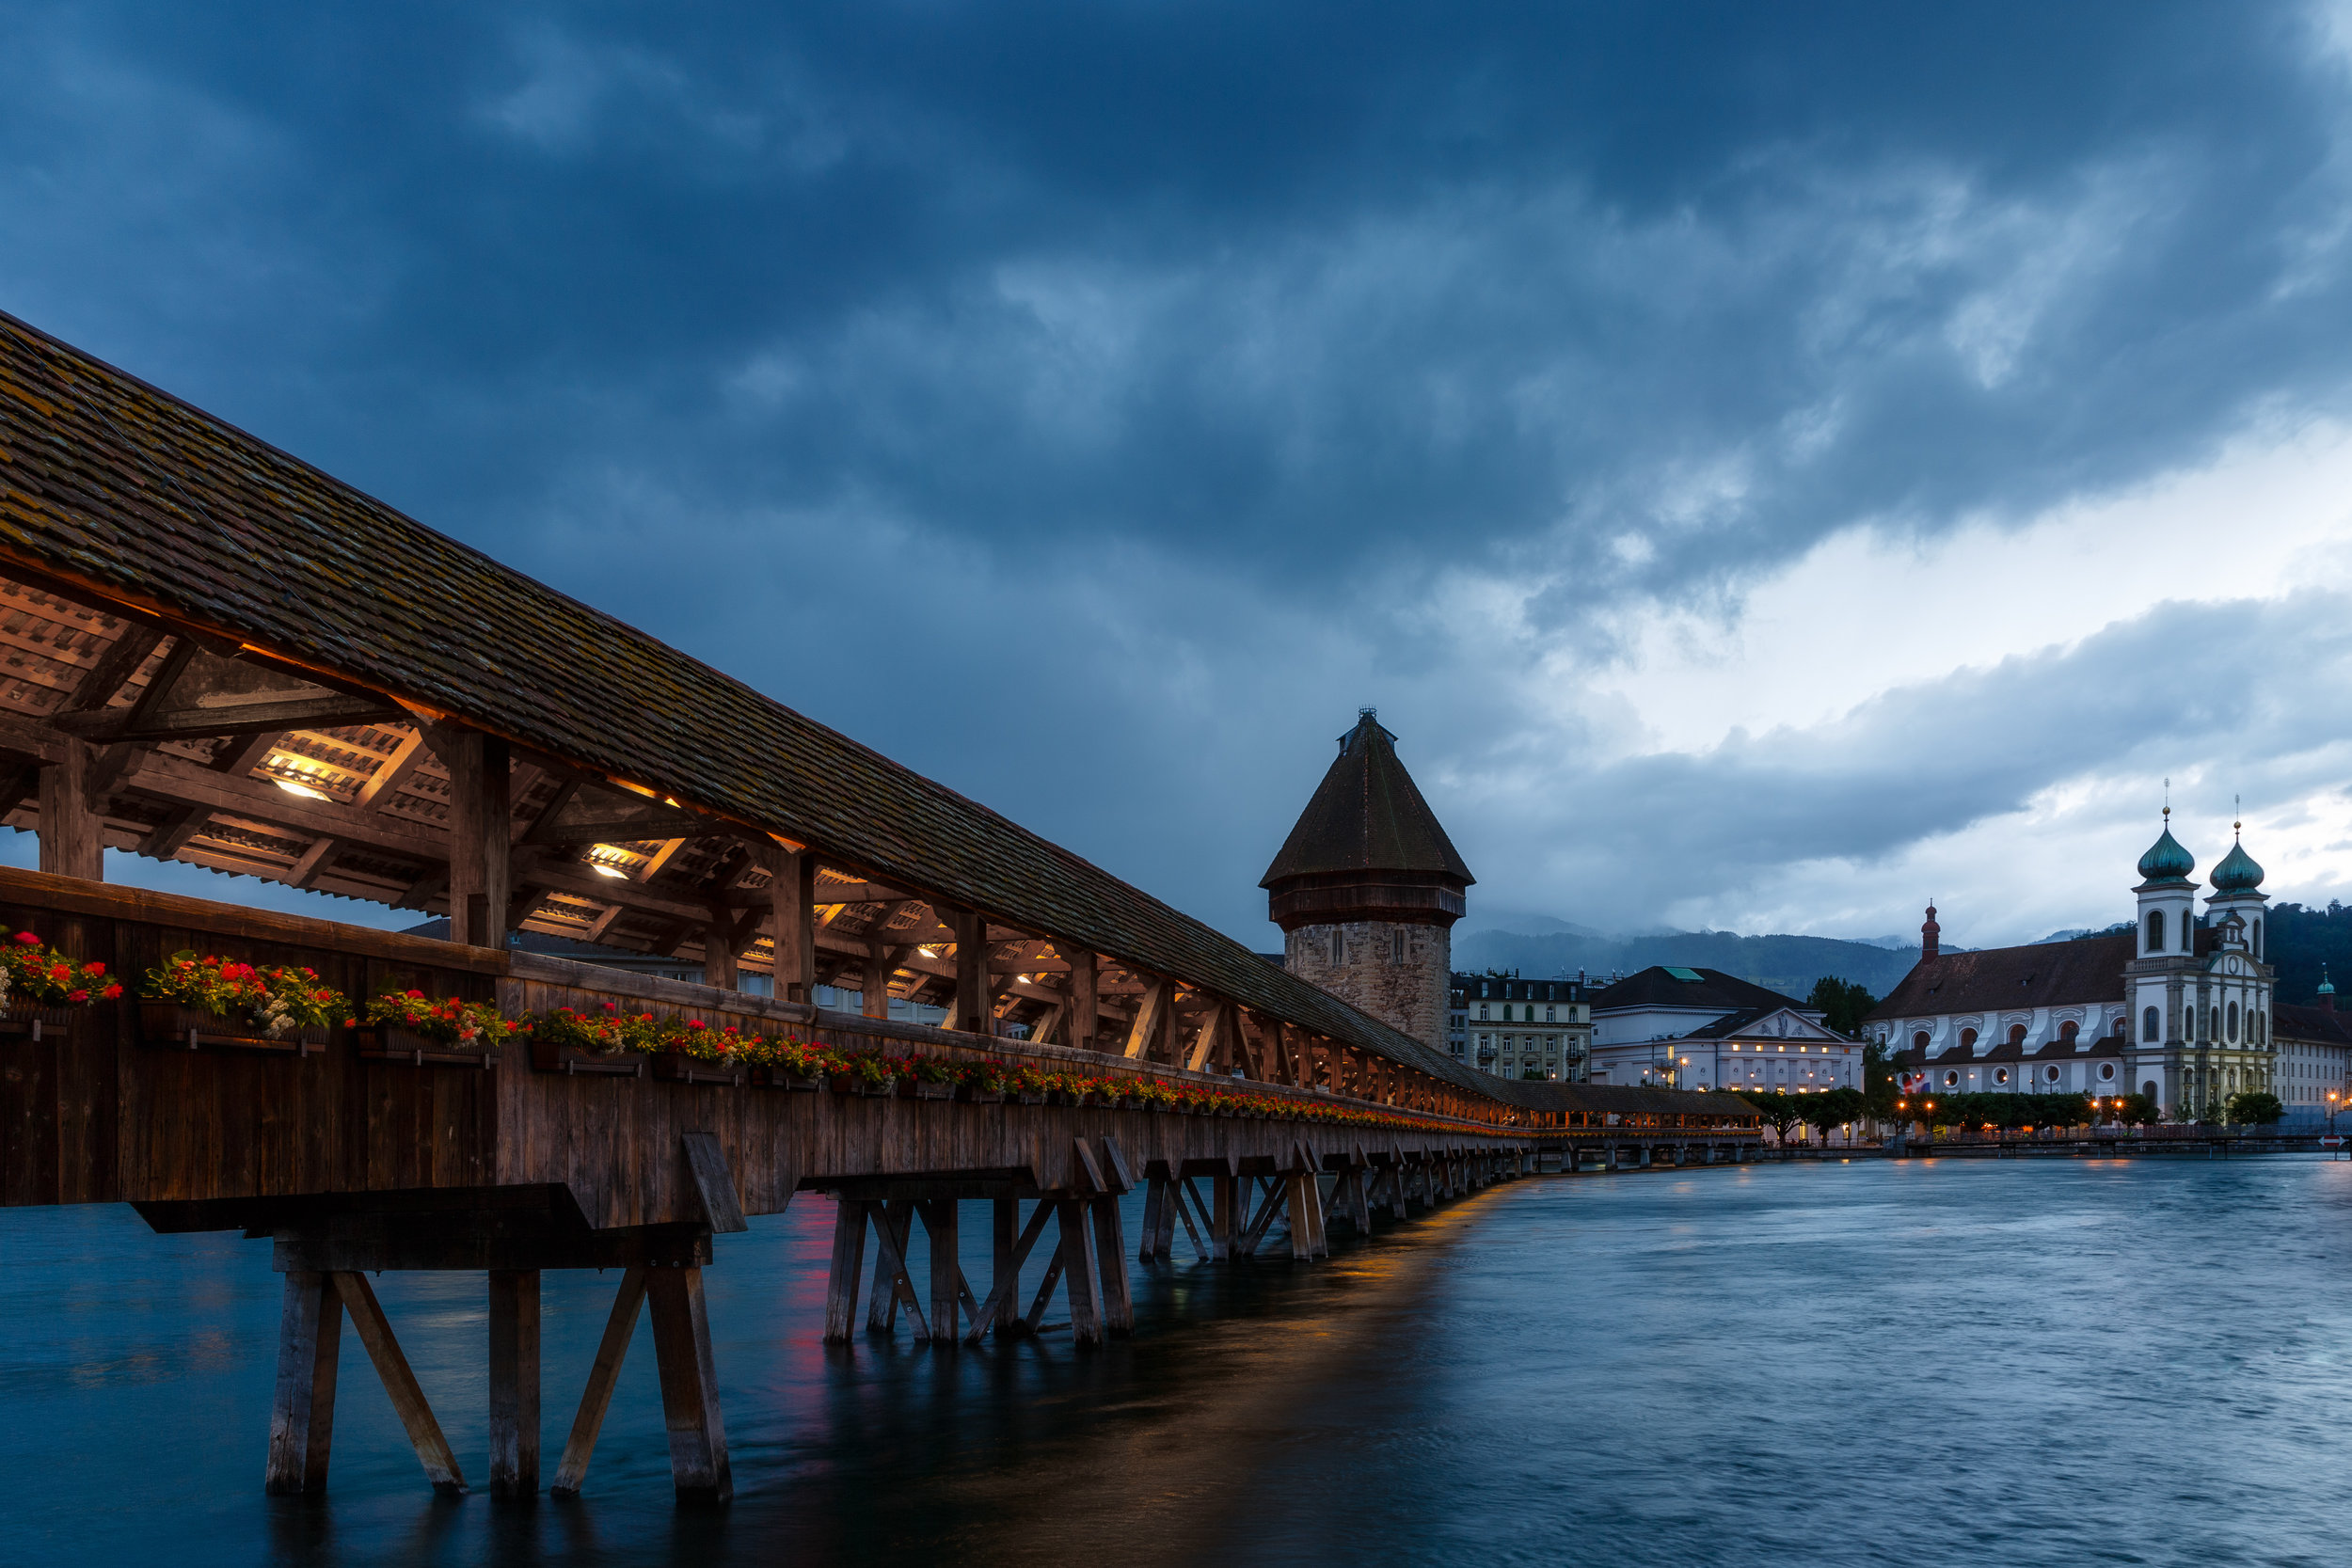 Rain descending on Lucerne and the Chapel Bridge